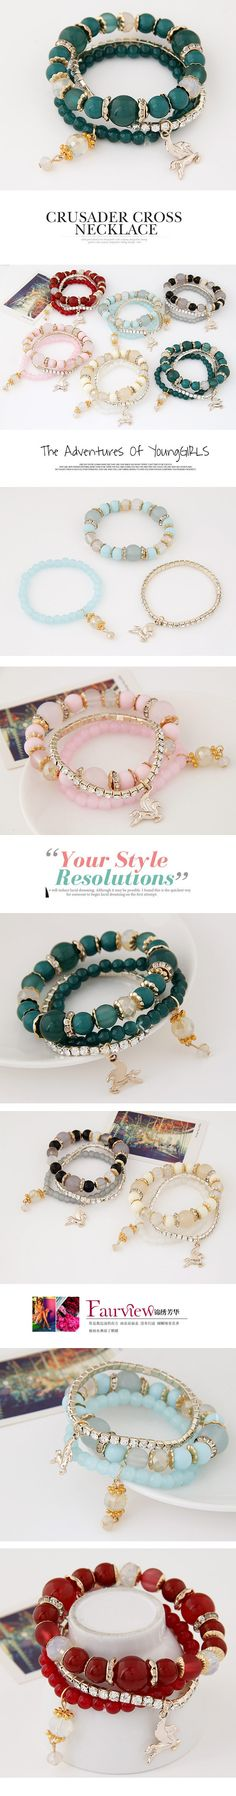 Wholesale Occident fashion easy match trendy graceful beads pendant multi-layer bracelet ( green )   Callesetas